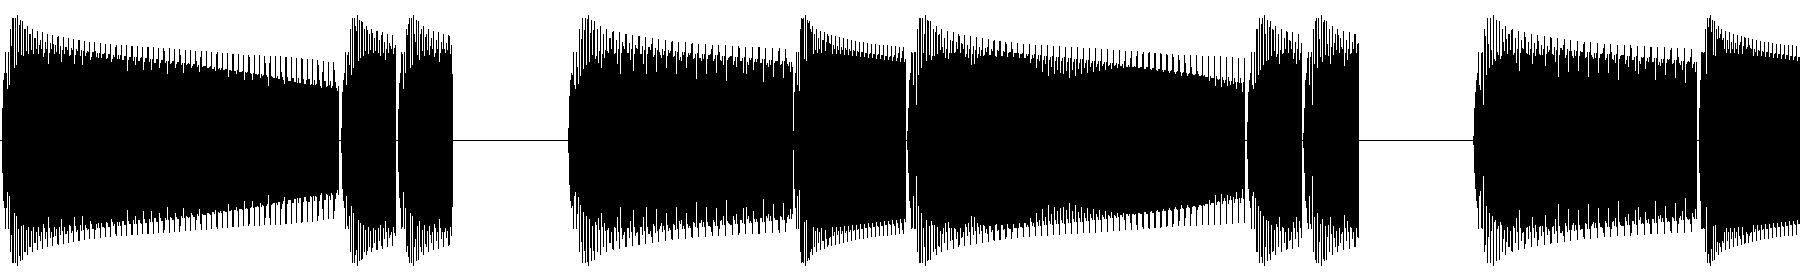 trap bass line